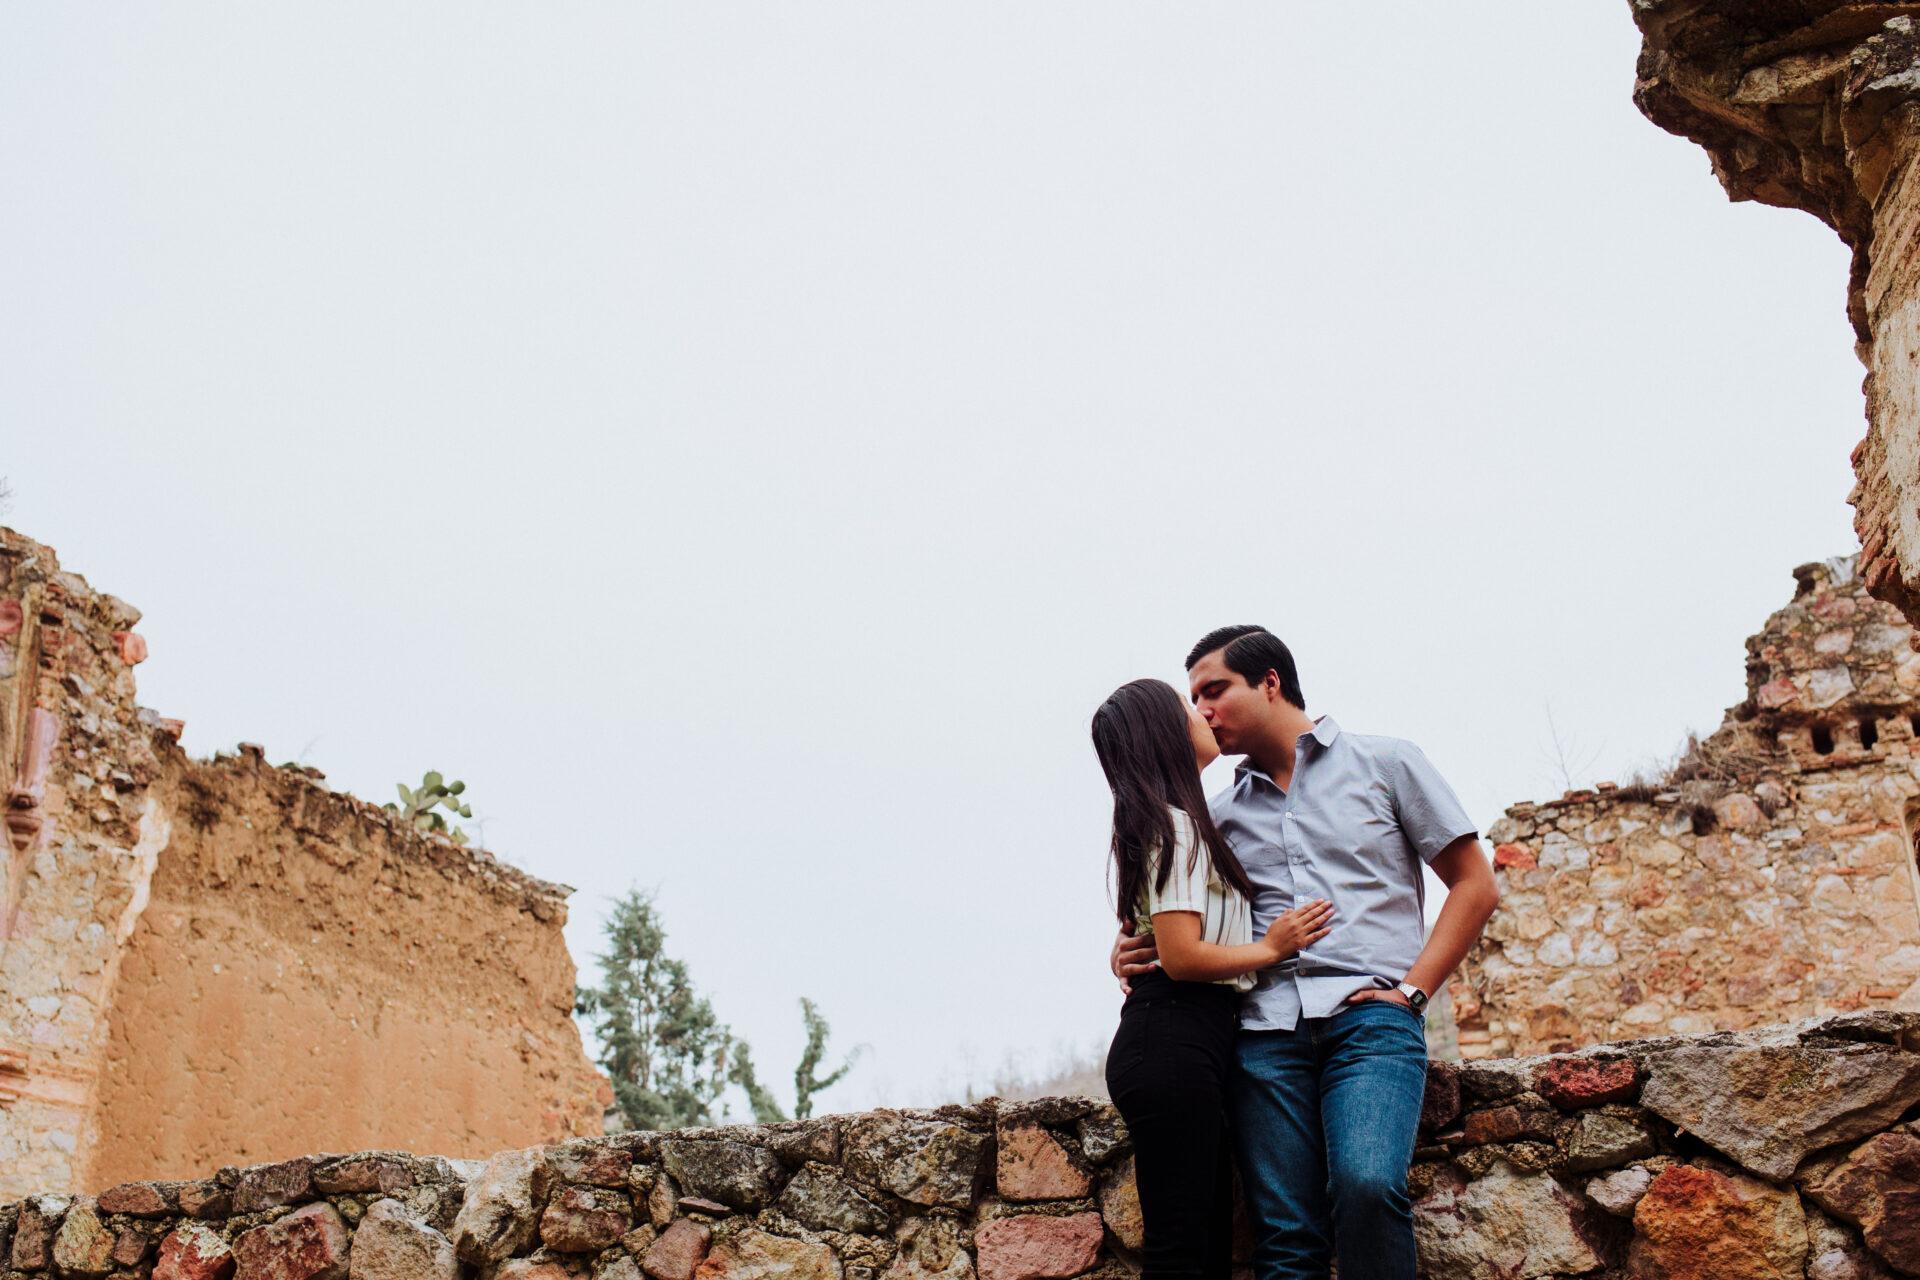 javier_noriega_fotografo_bodas_sesion_casual_zacatecas_wedding_photographer4